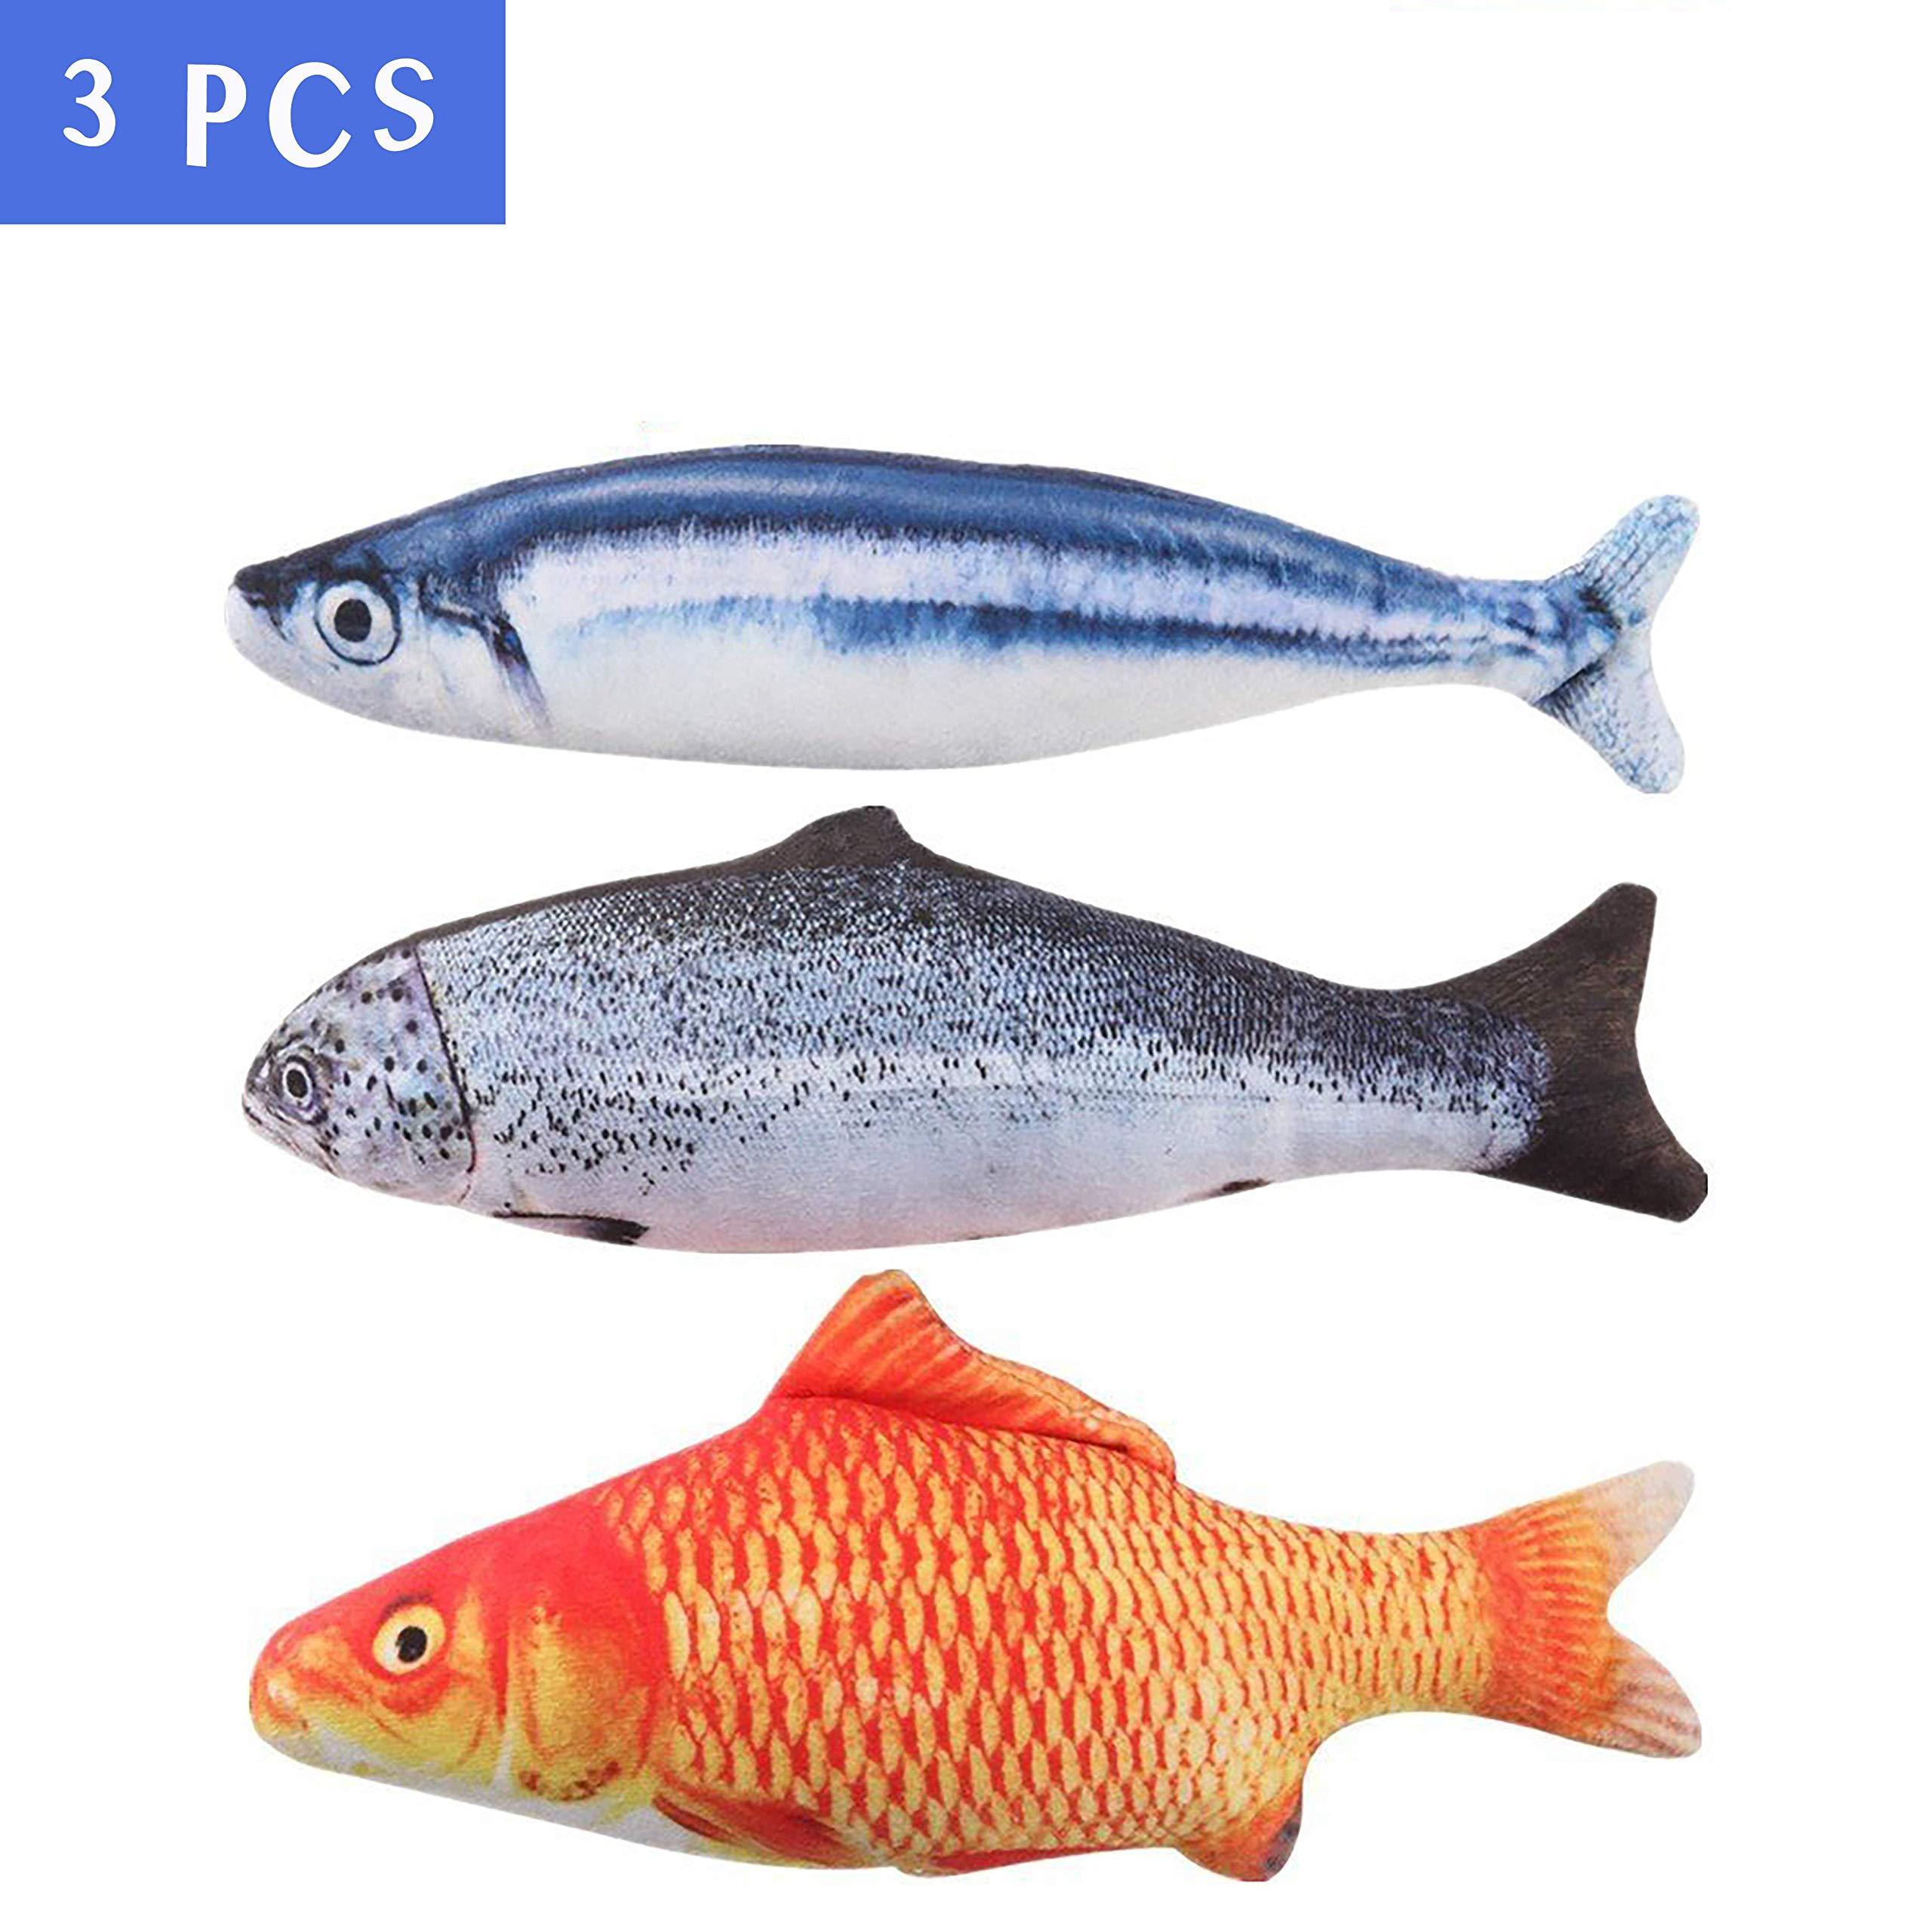 MAXXV® Catnip Fish Toys for Cats - North American Organic Catnip - 3PCS Catnip Toys for Cats - 11.5\